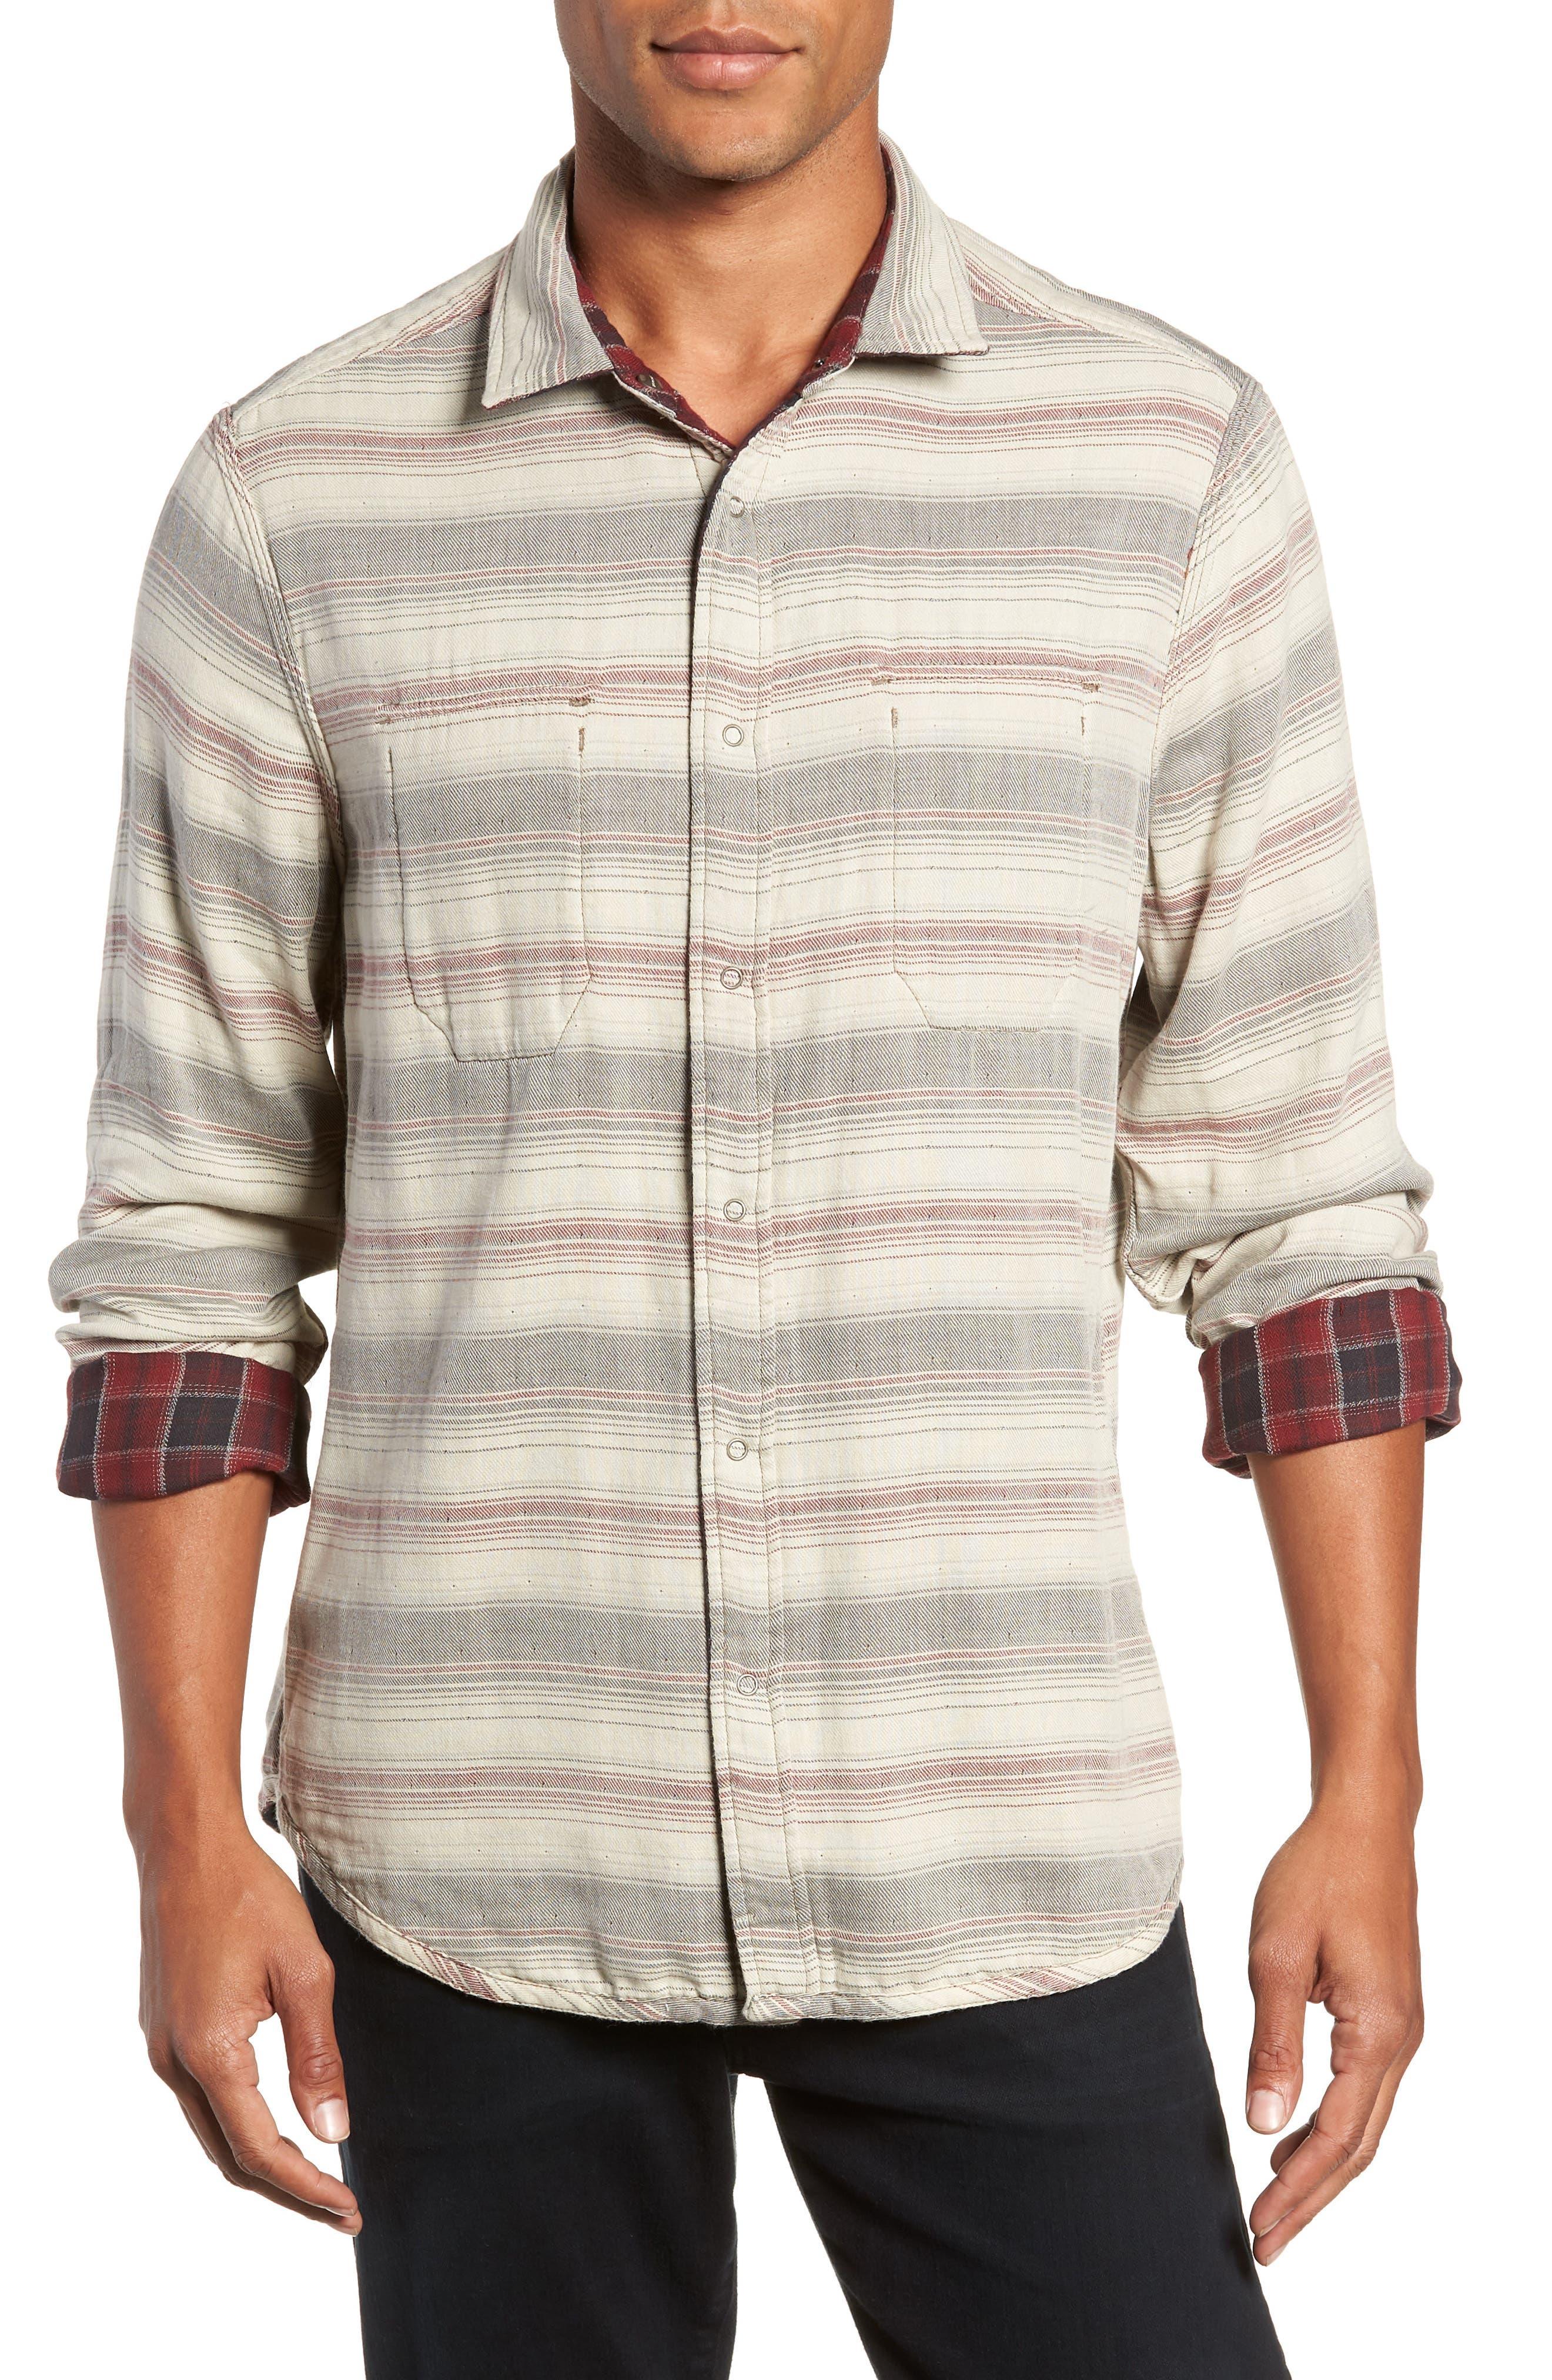 Boulder Regular Fit Reversible Plaid Shirt,                             Alternate thumbnail 2, color,                             OXBLOOD